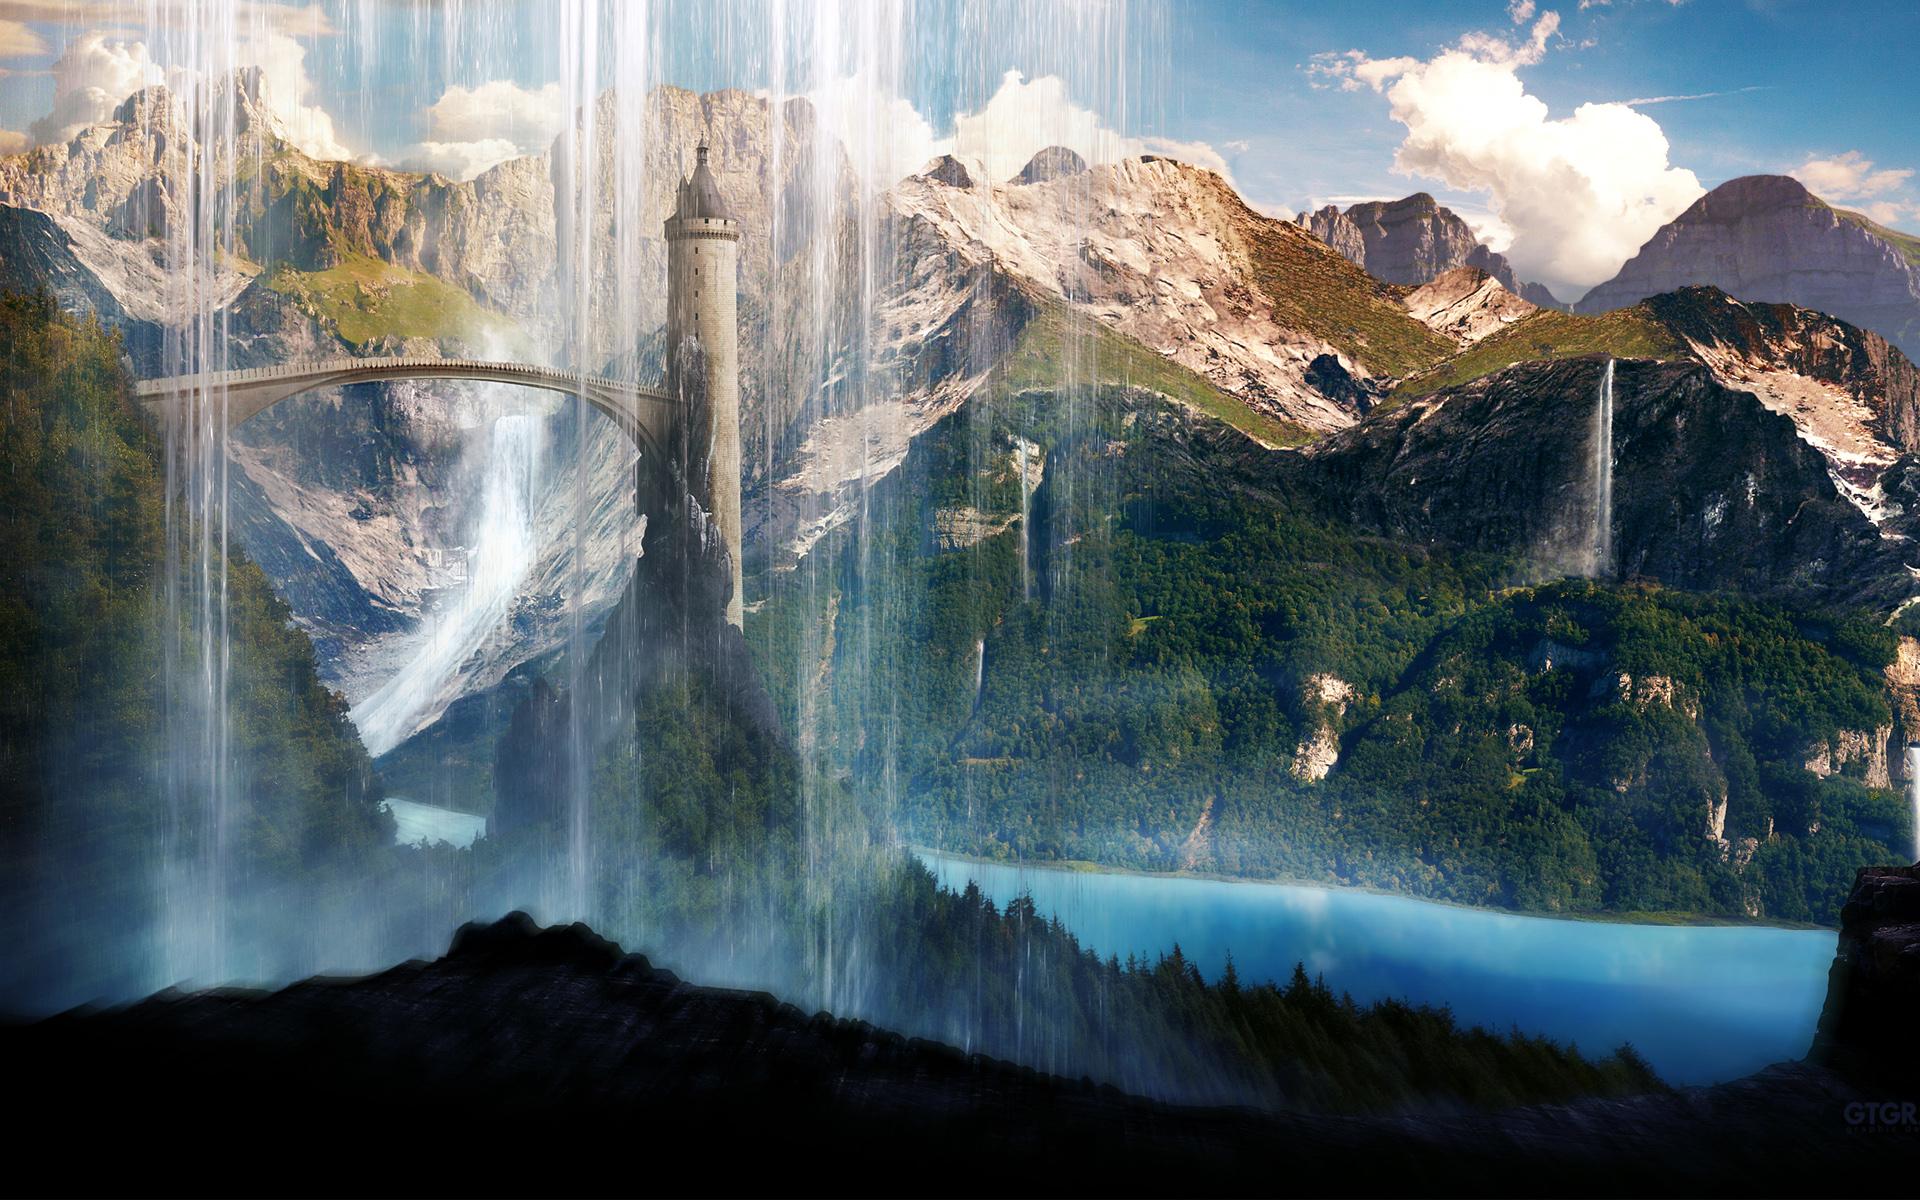 Download 3d Wallpaper Apk Waterfalls Scenery Wallpapers Wallpapers Hd